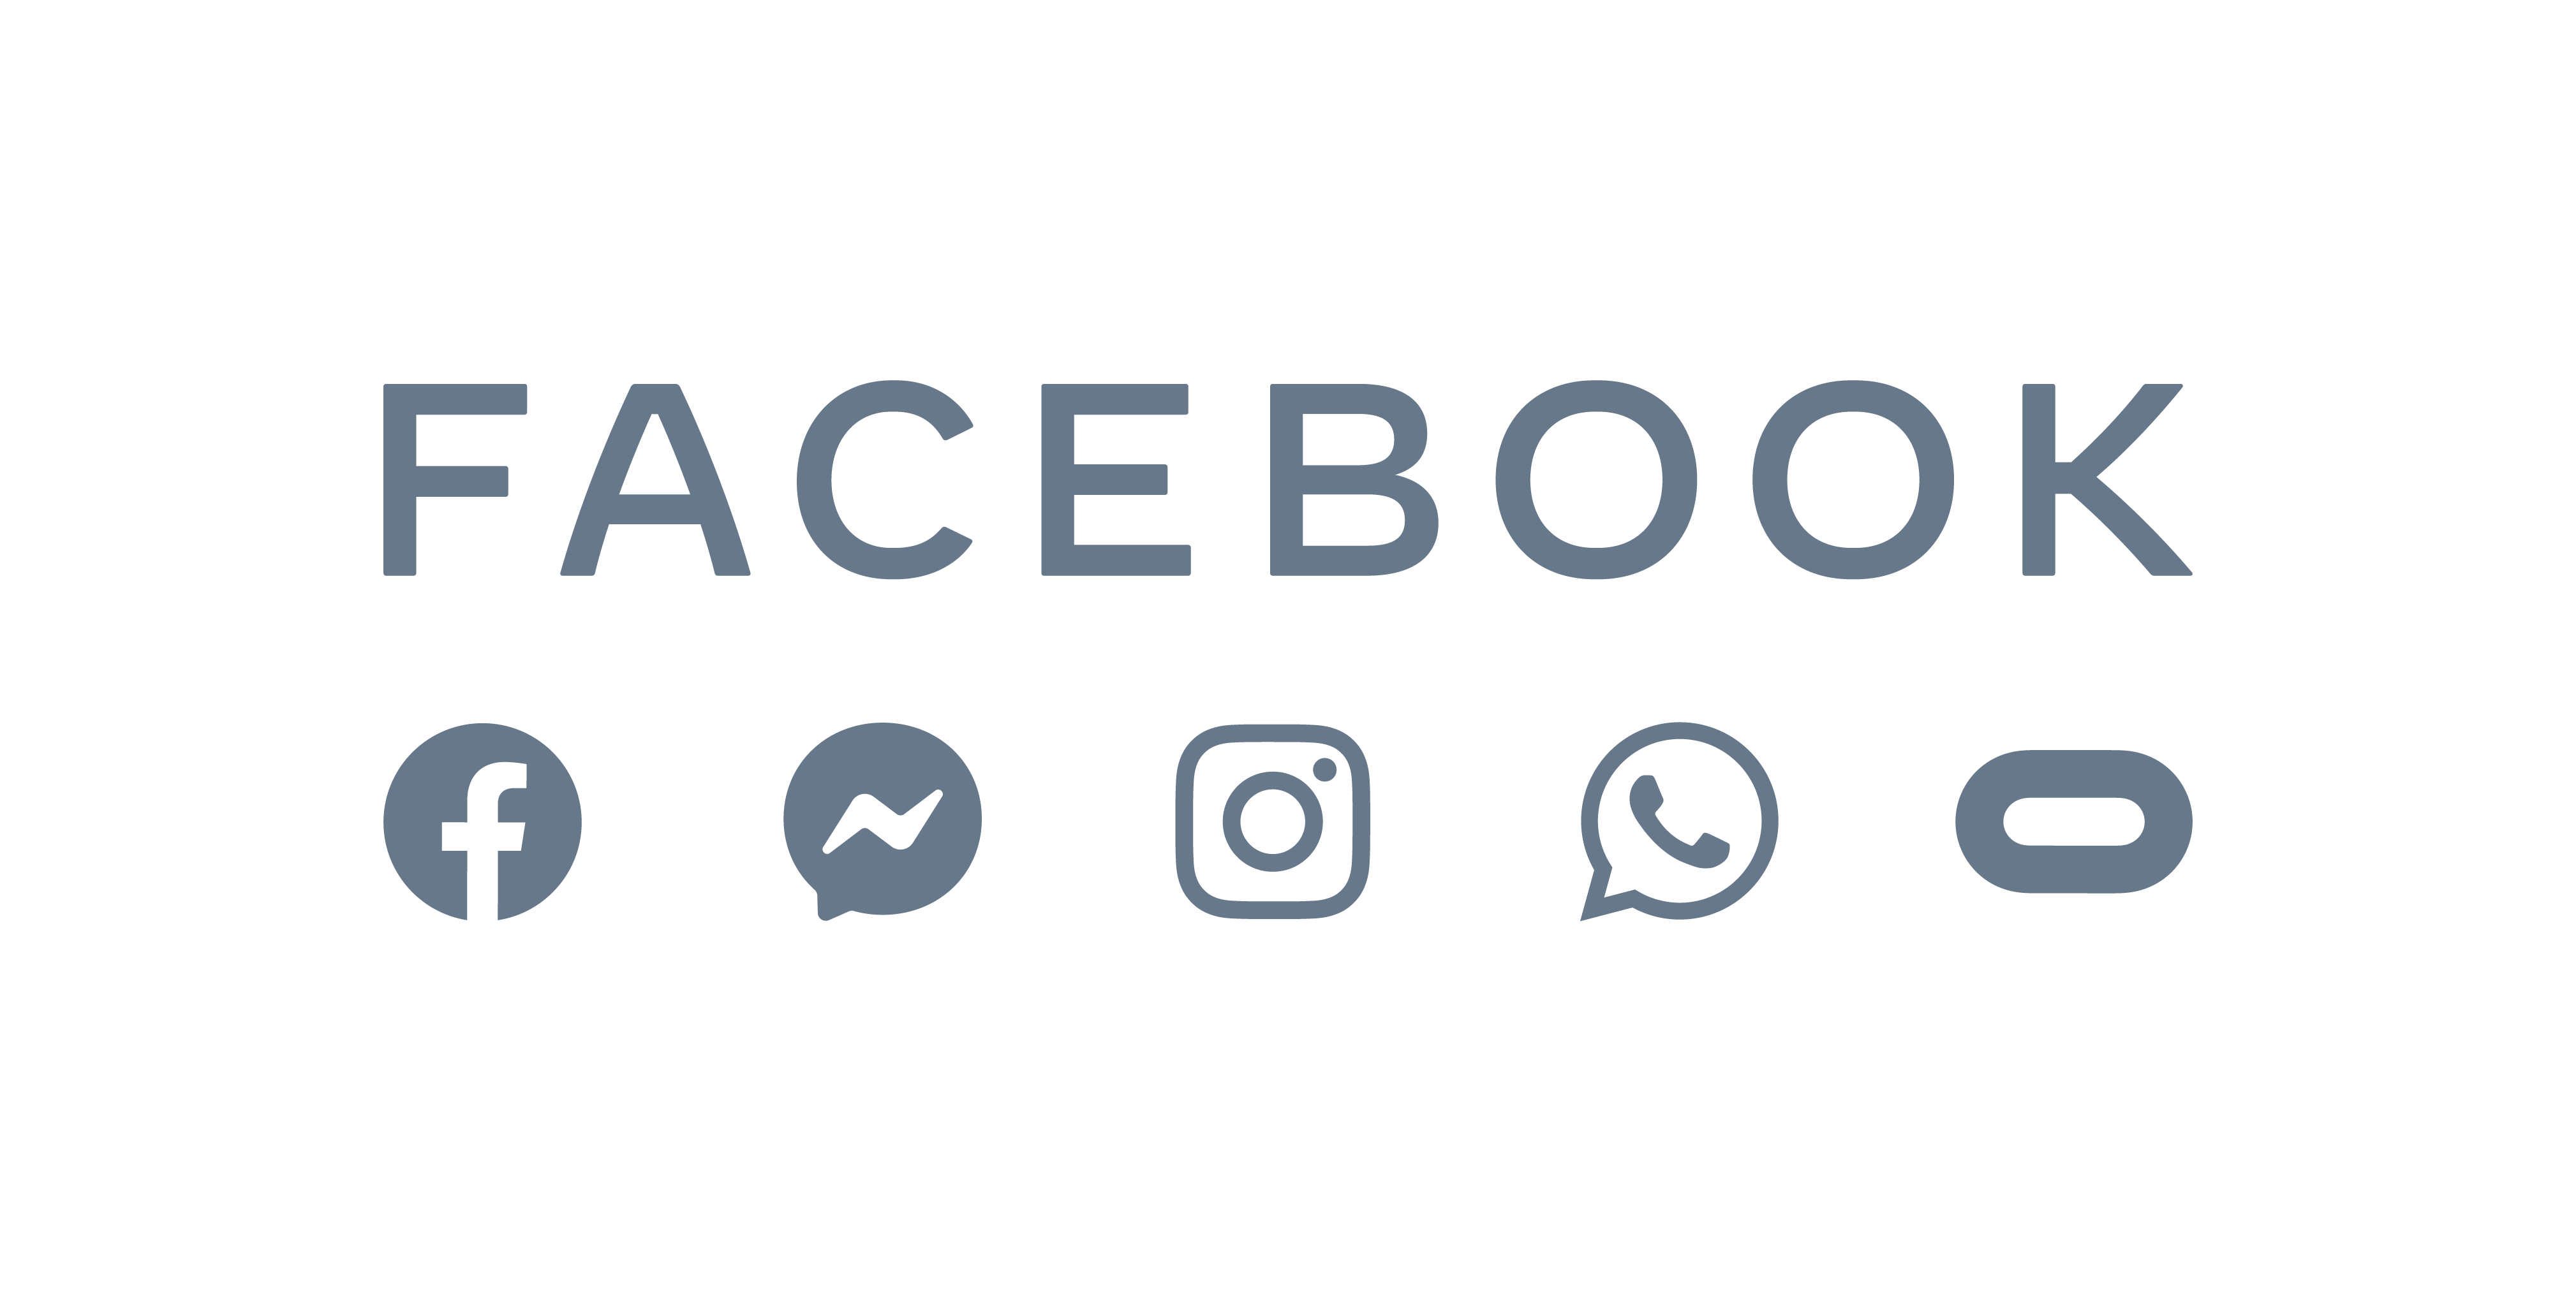 FBco_Interim_family_lockup_Stacked_FB_Blue_Gray_RGB